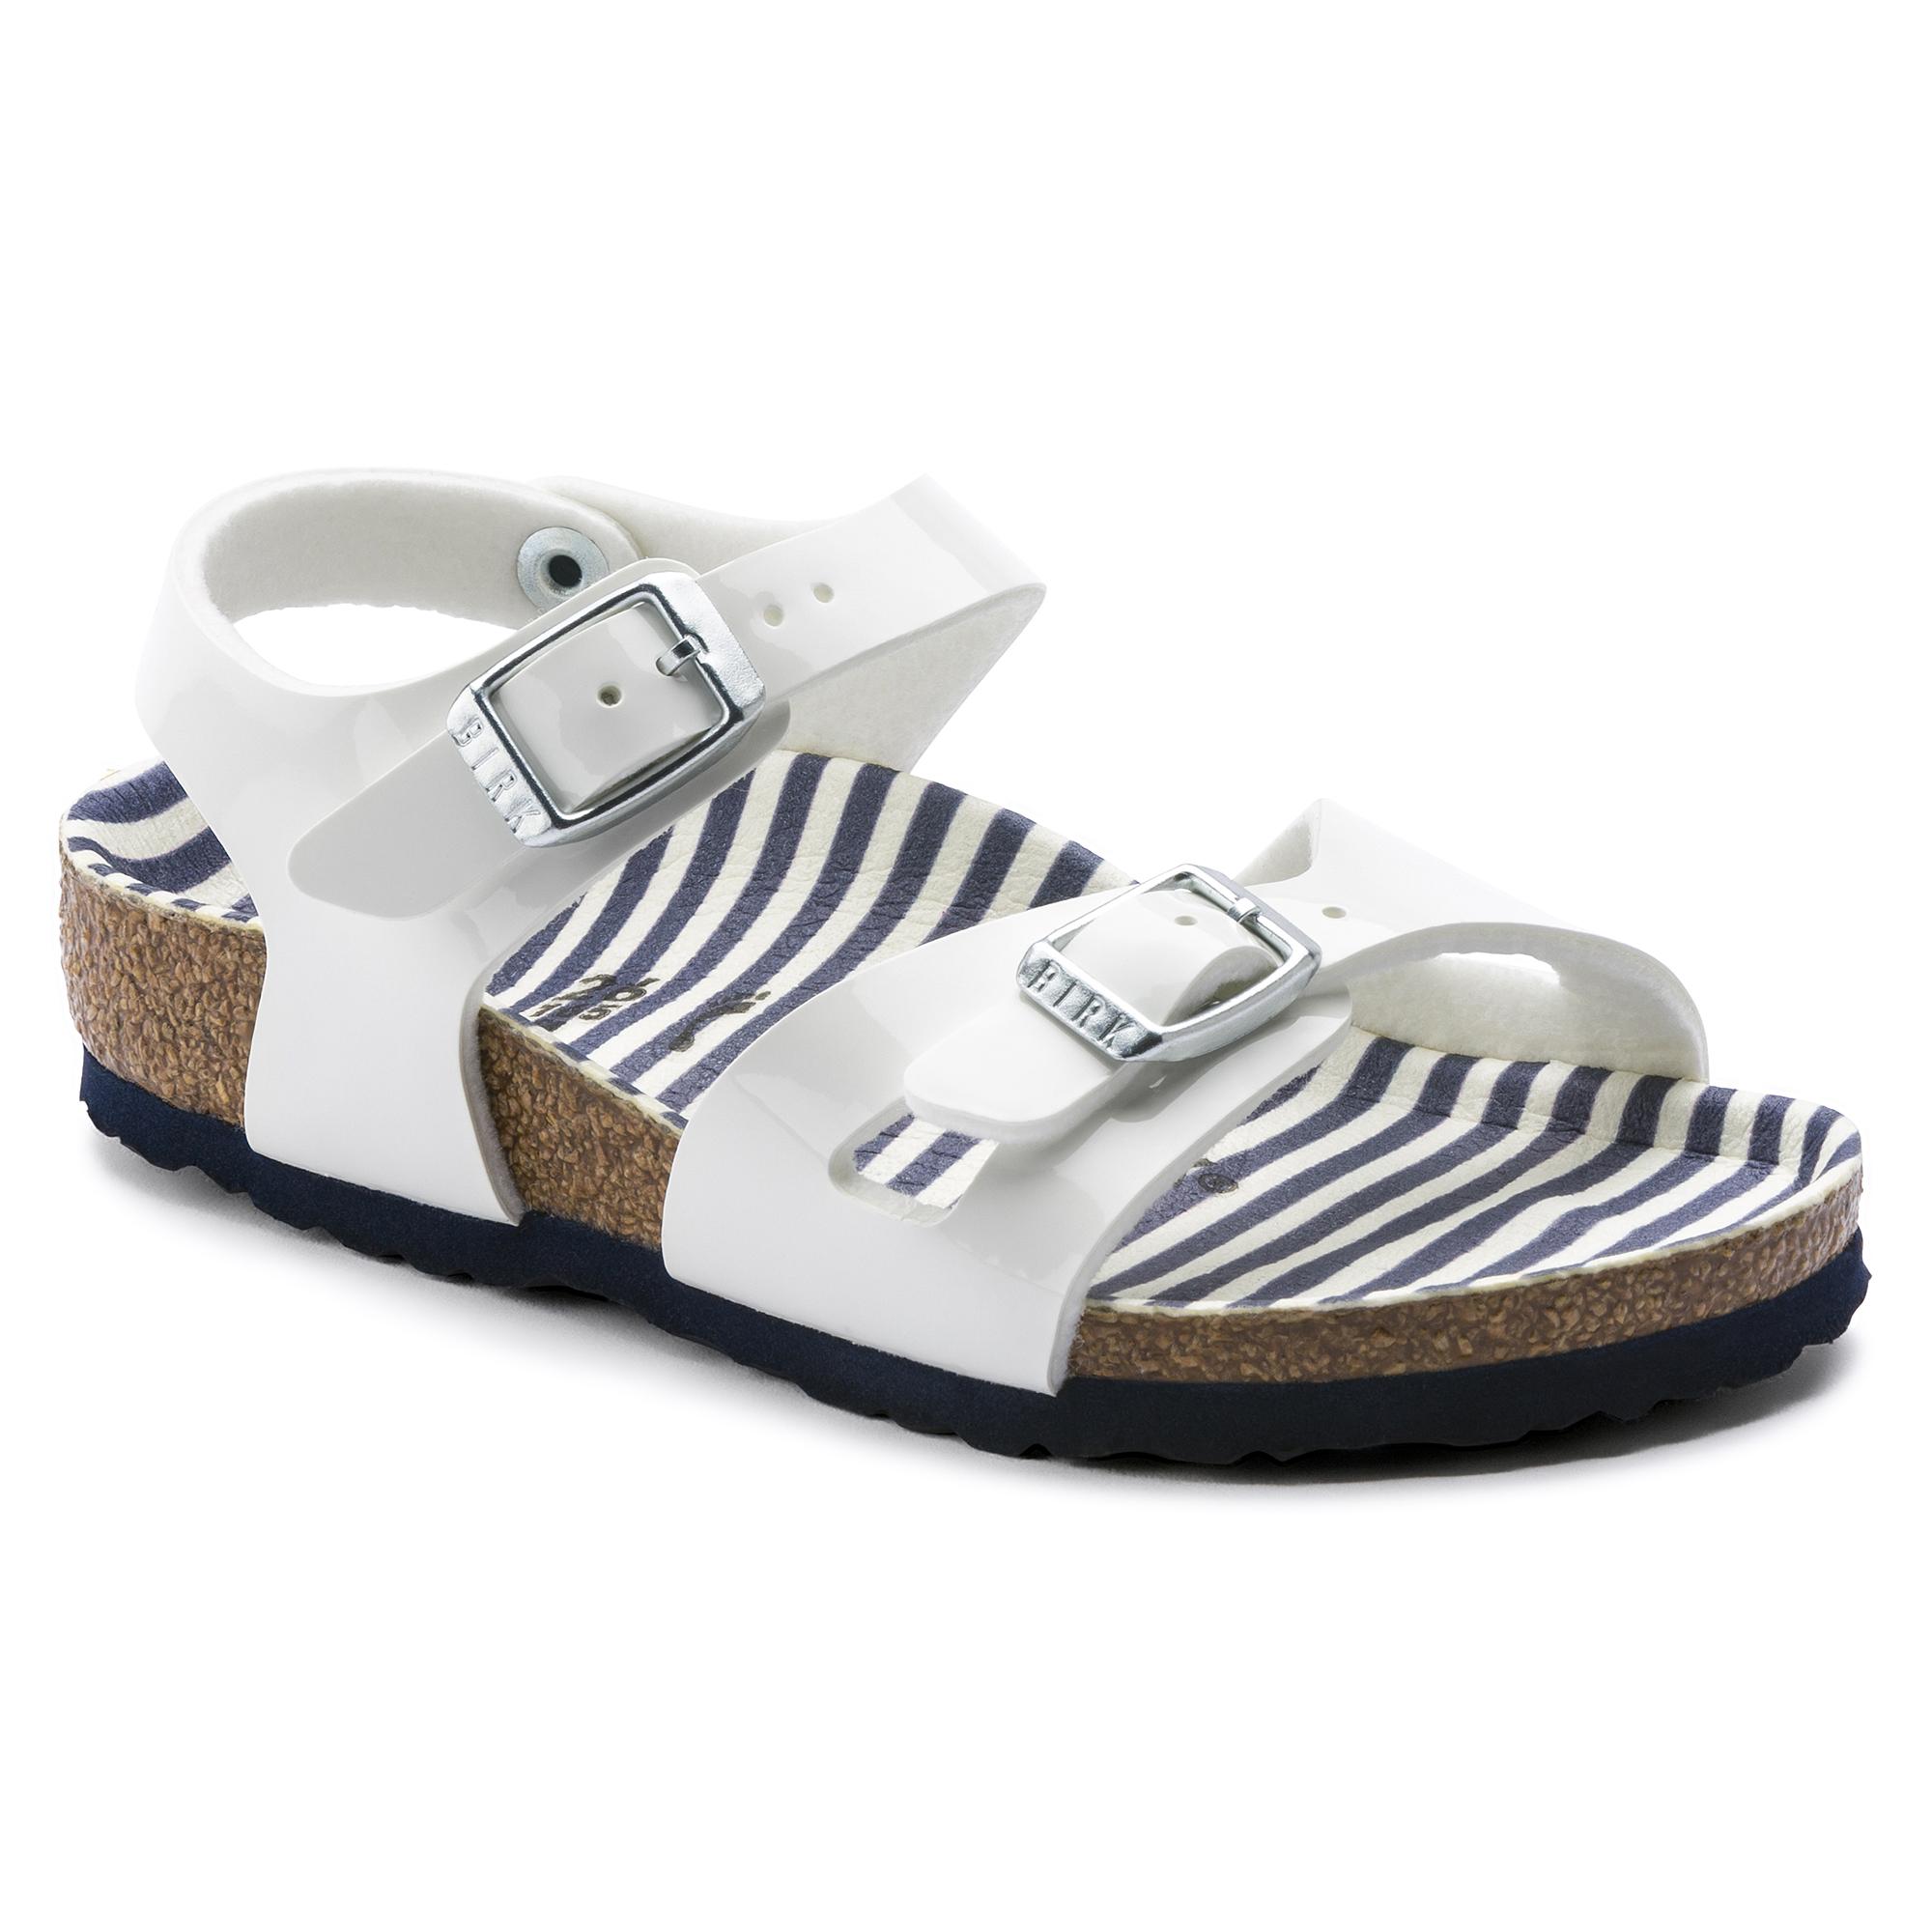 ed4e7db6cc Rio Birko-Flor Patent Nautical Stripes White ...